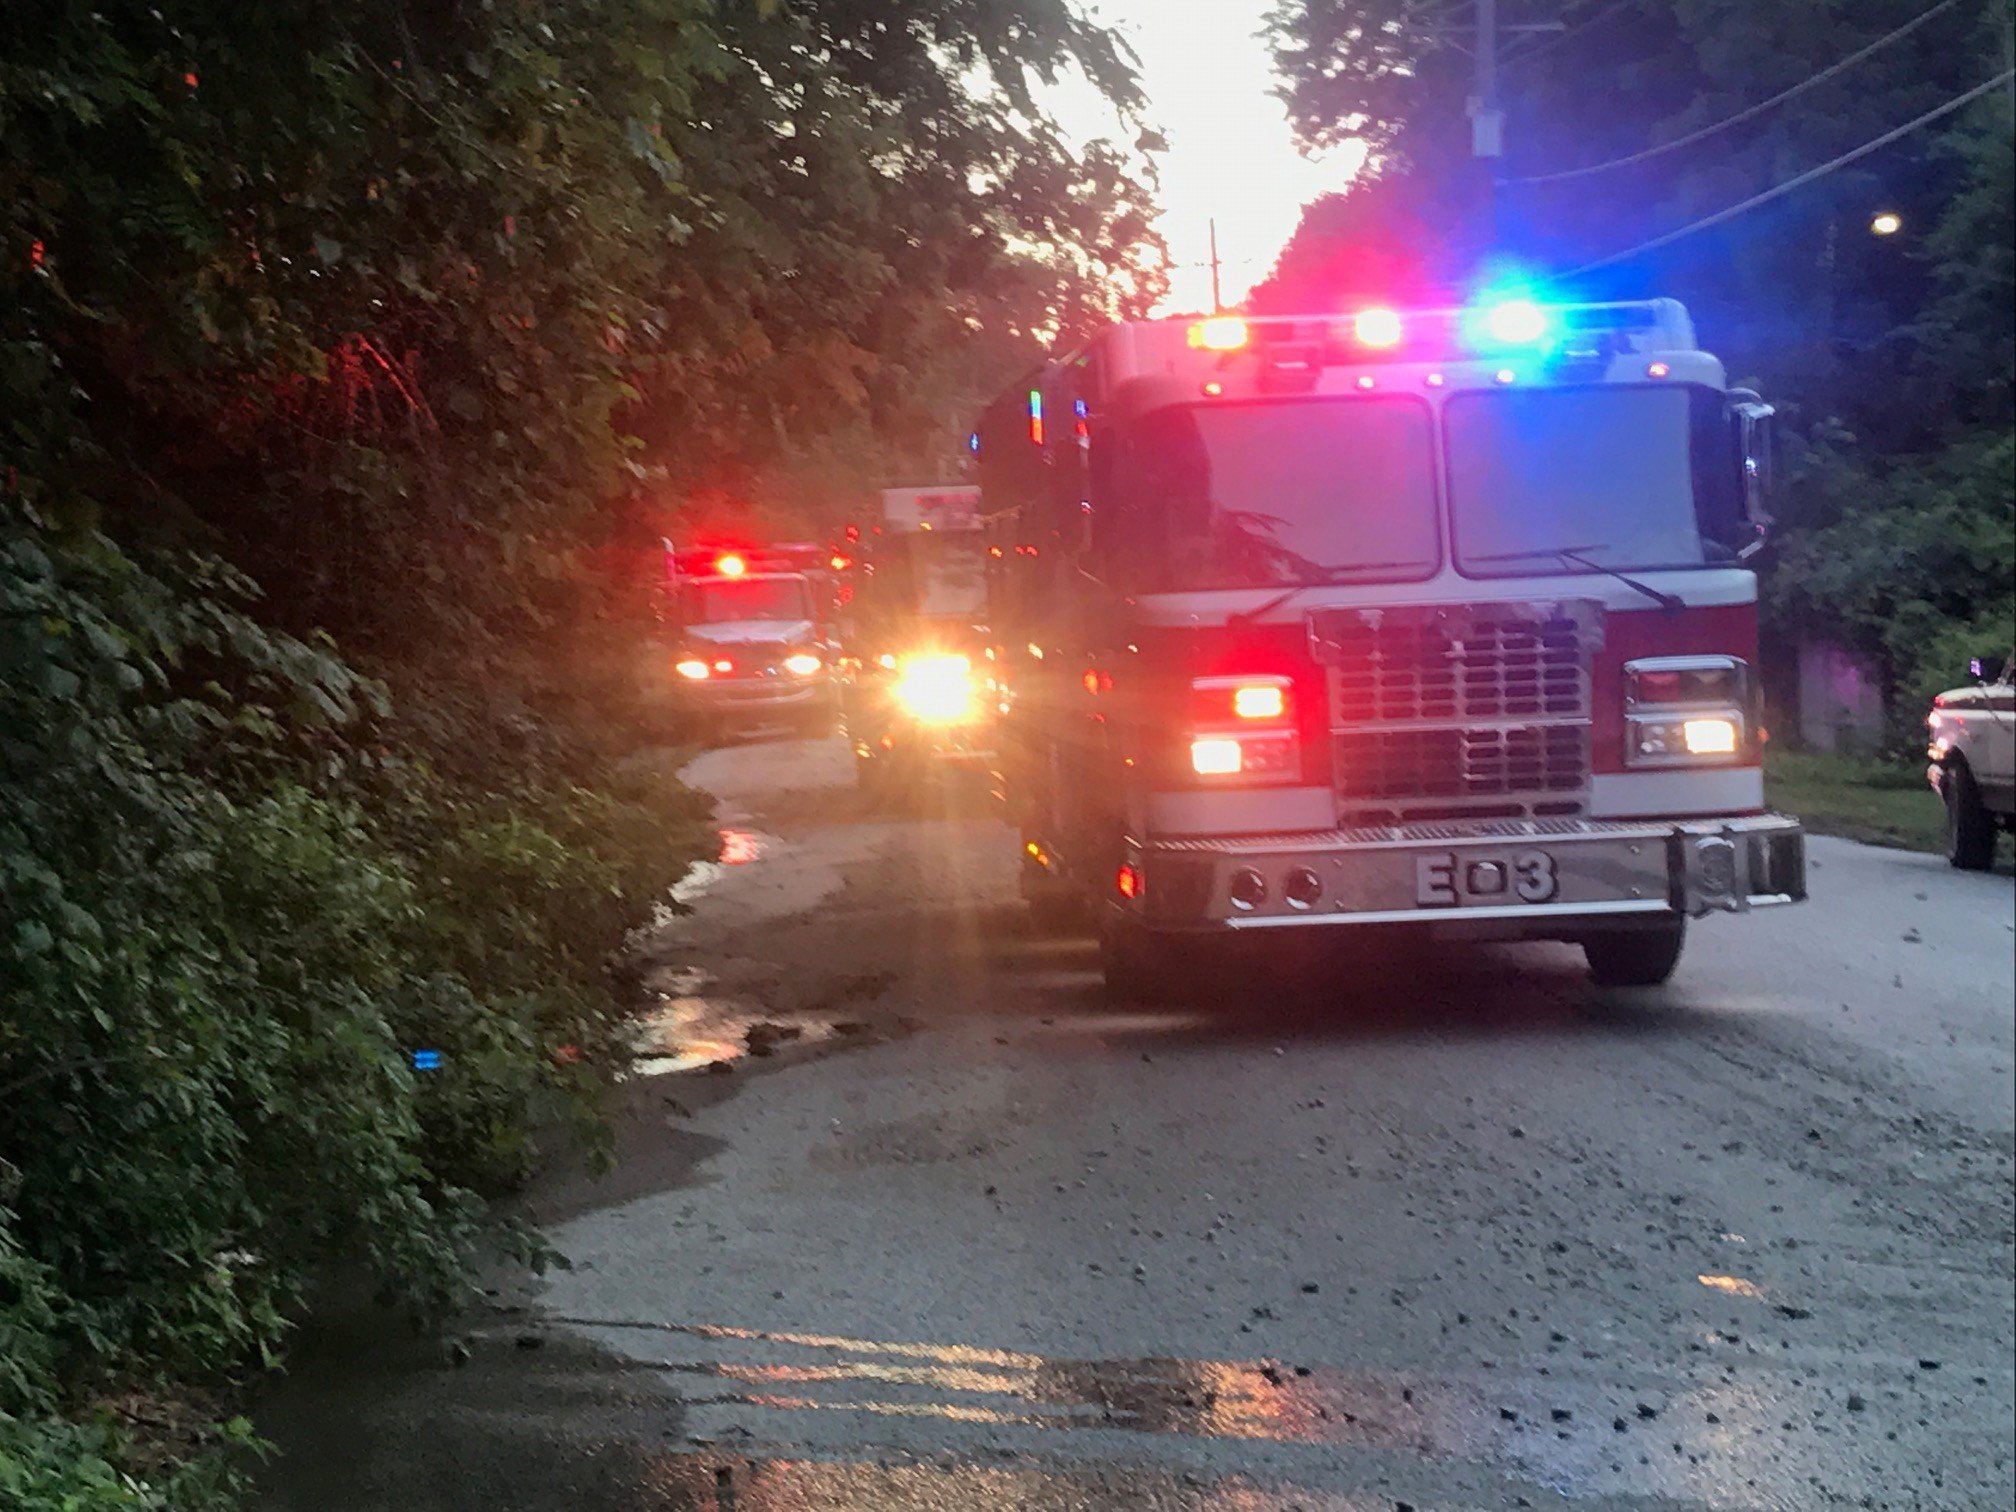 Fire trucks on scene